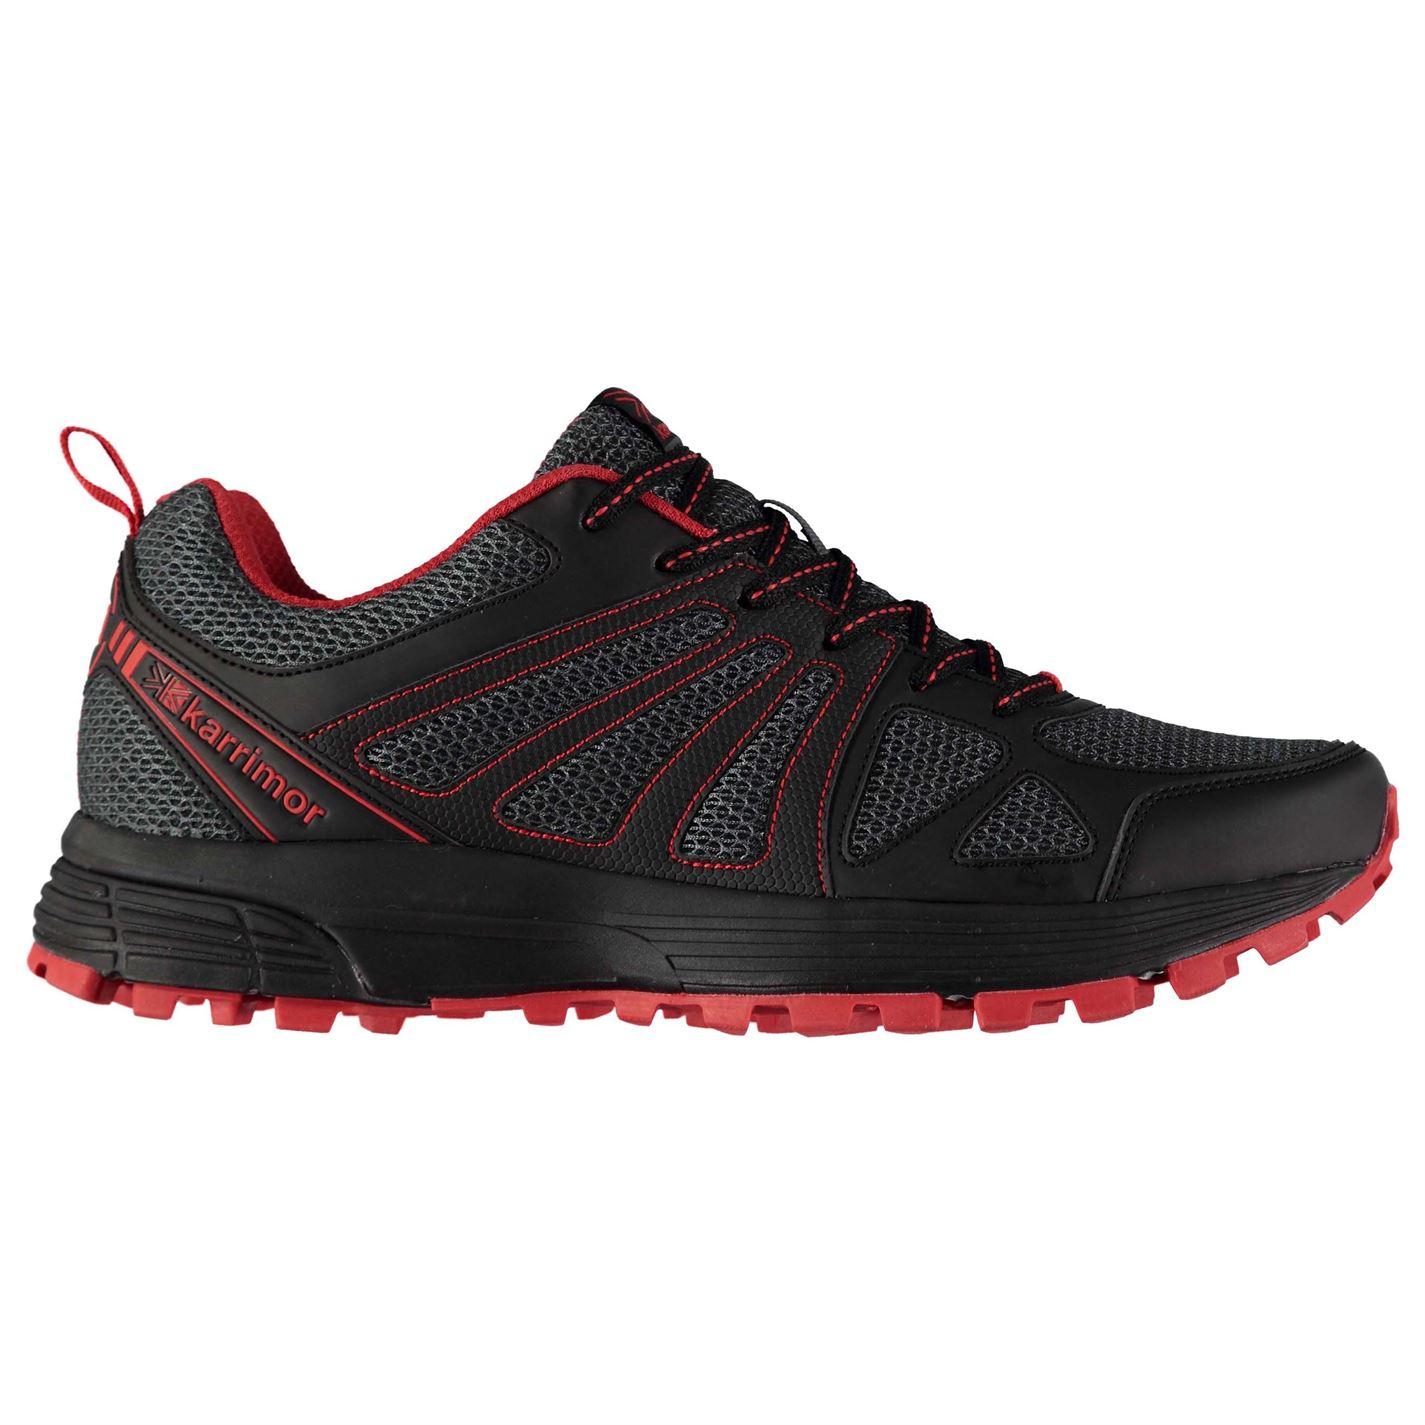 Karrimor Caracal pánske bežecké topánky